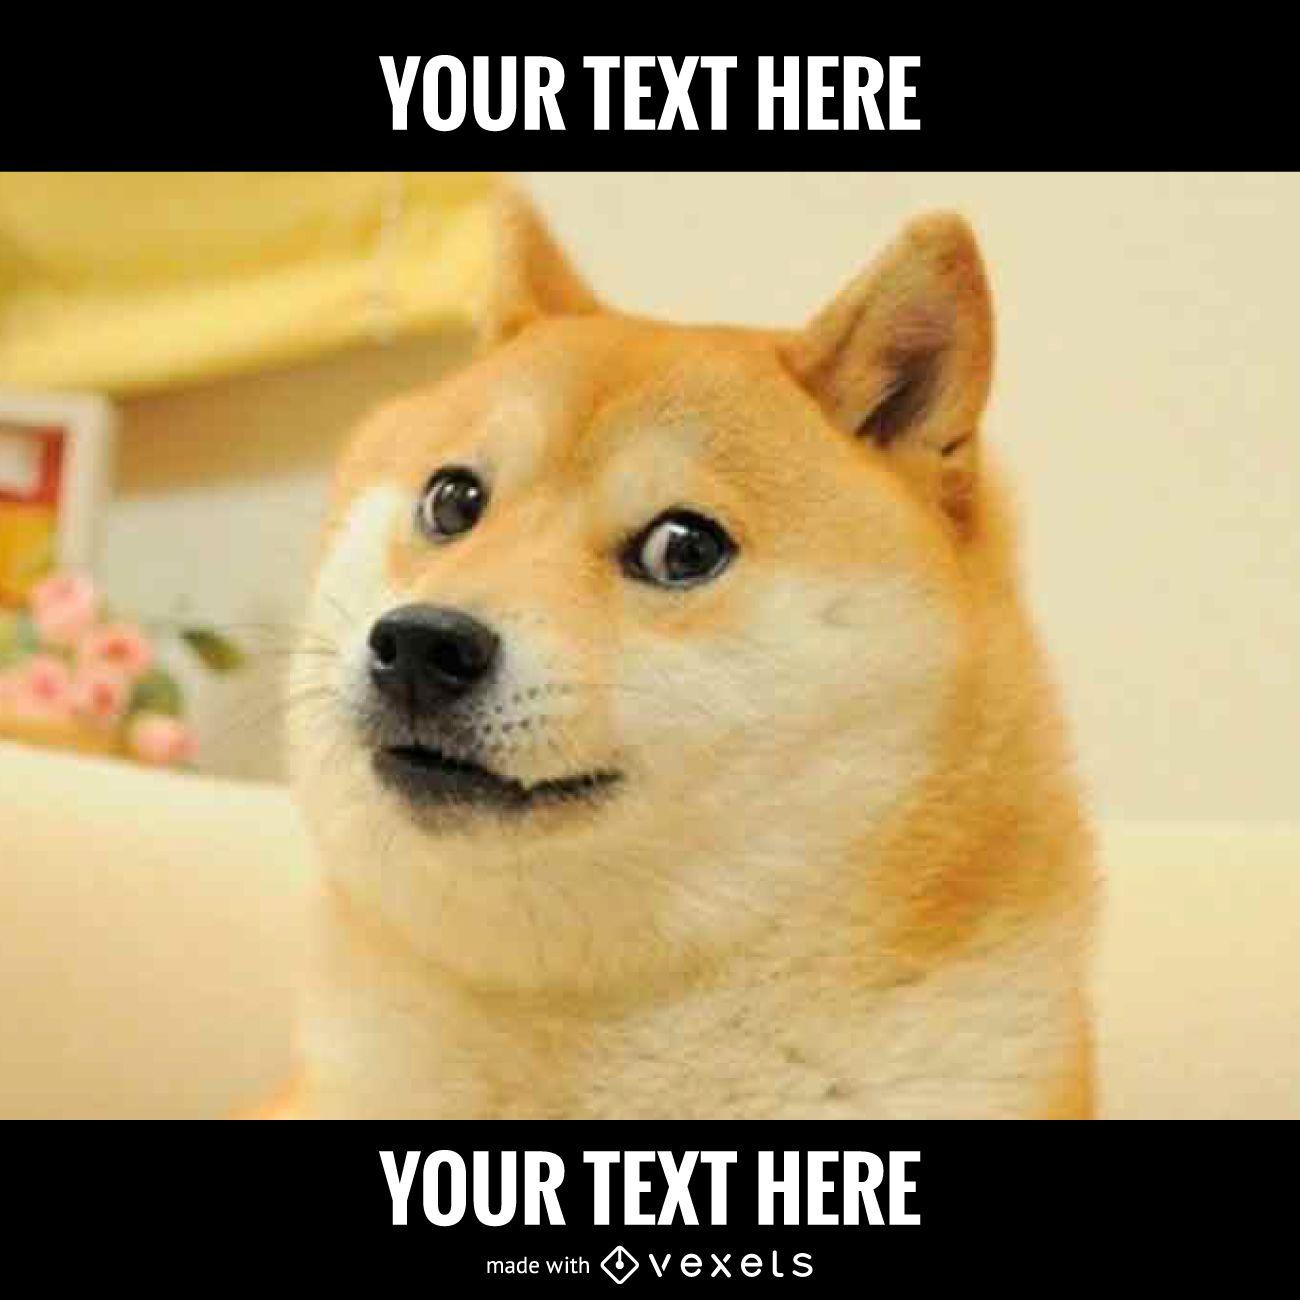 Dog meme generator